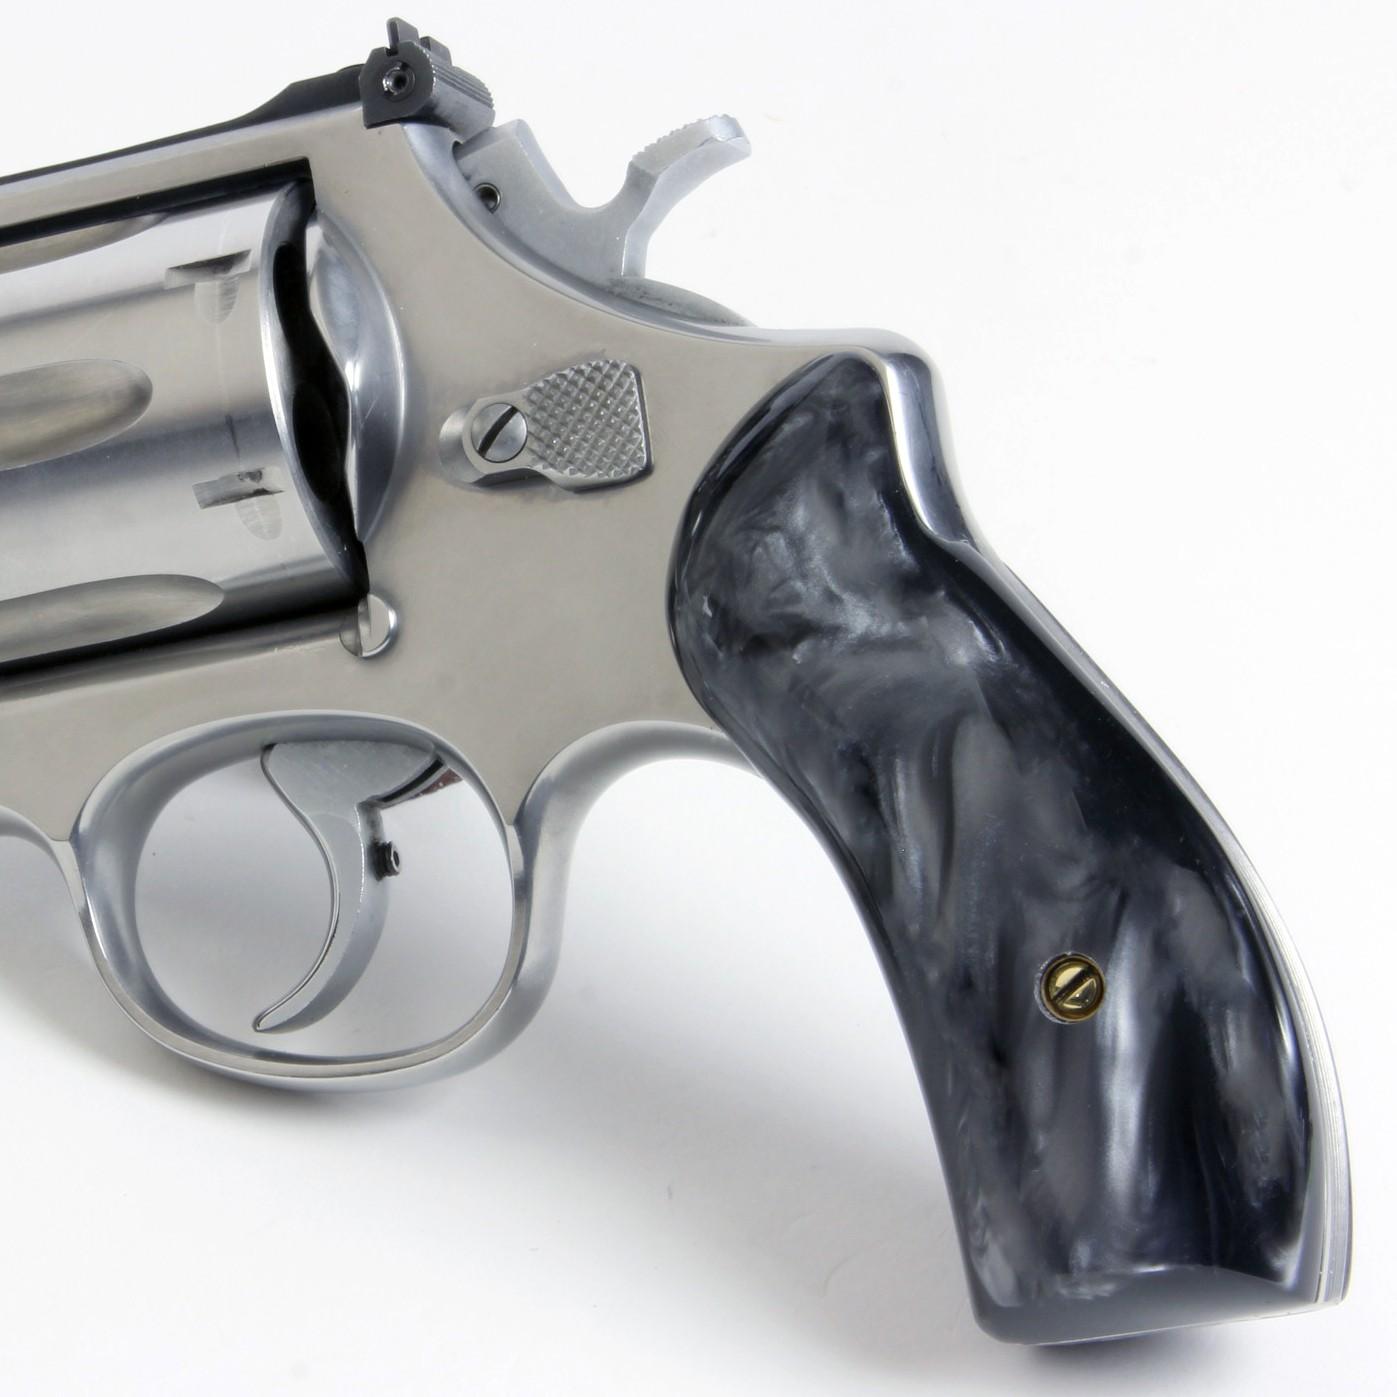 S&W J Frame Round Butt Kirinite® Black Pearl Grips